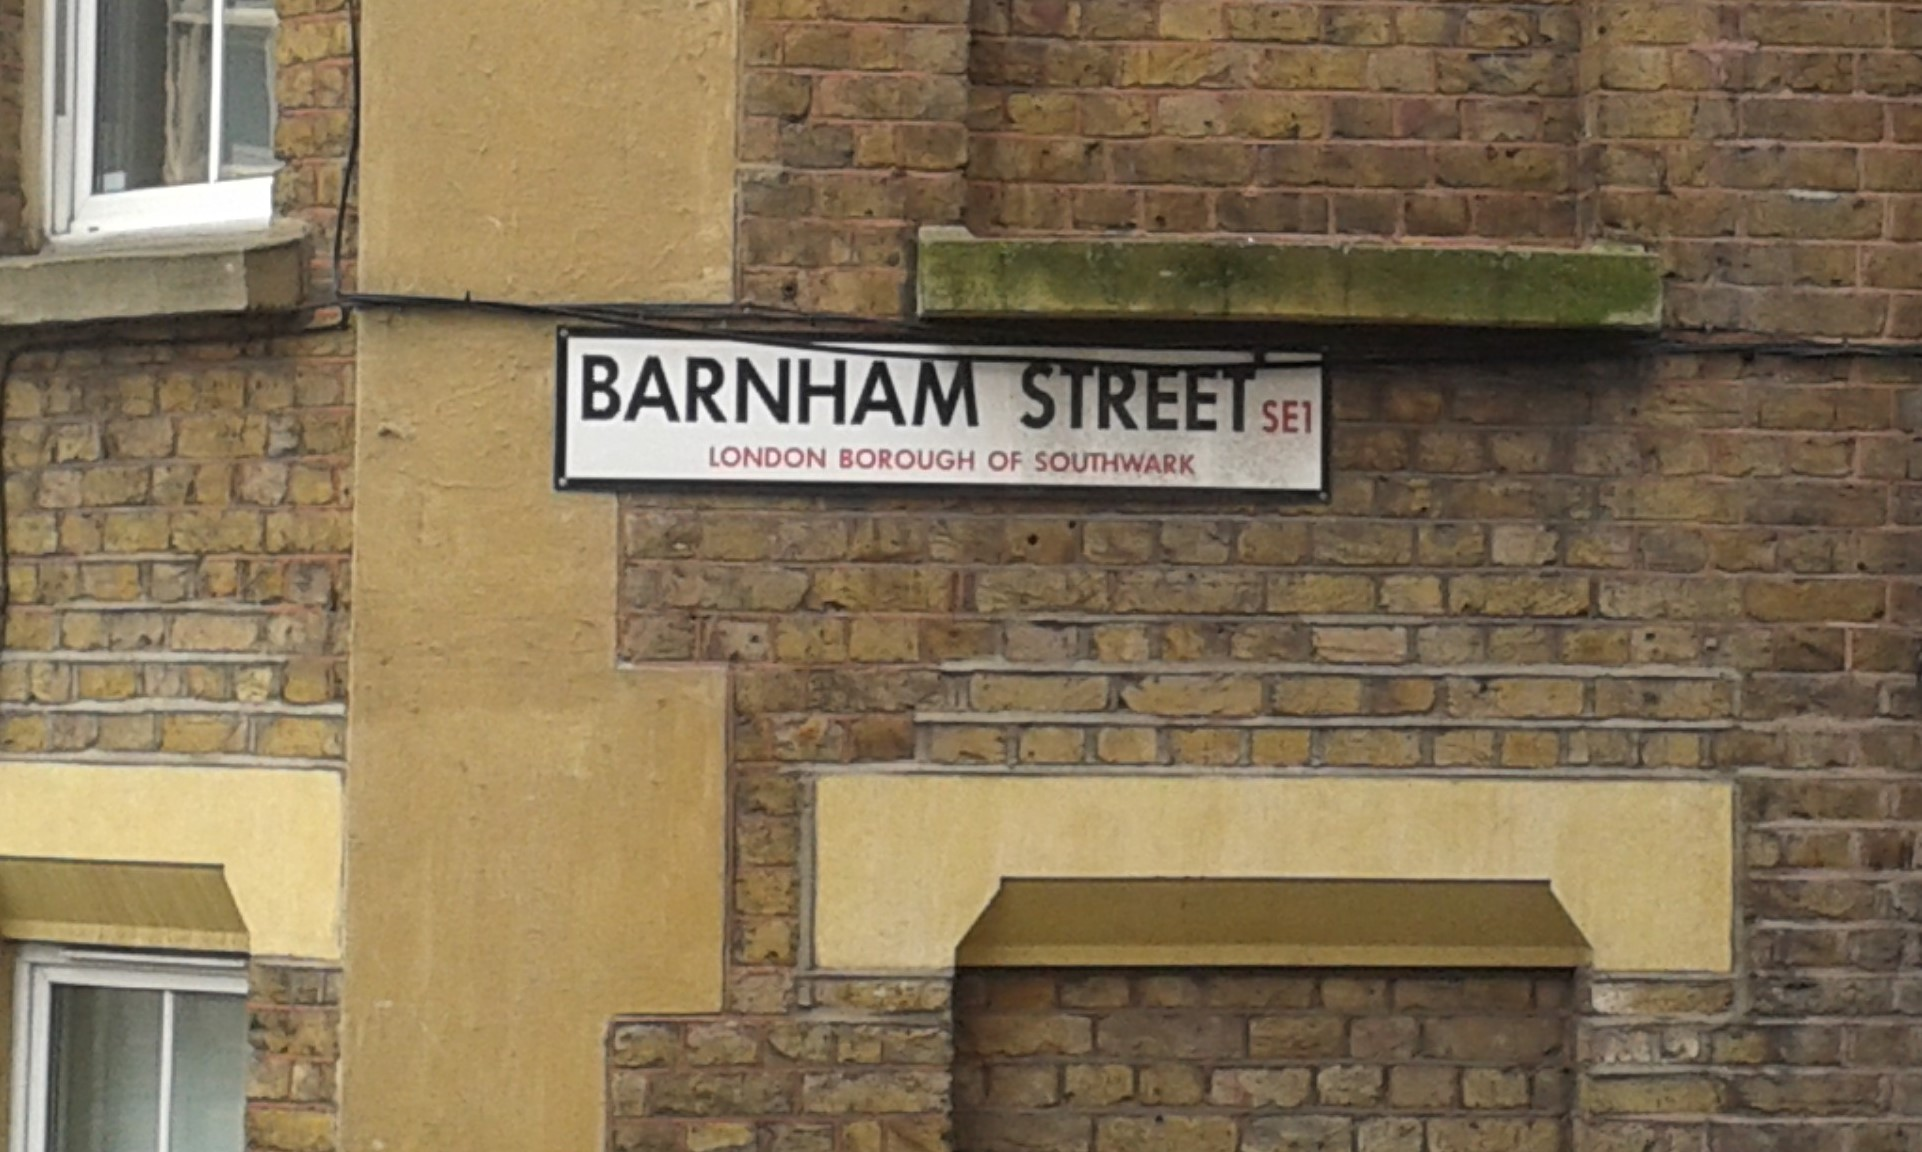 Chris Barnham